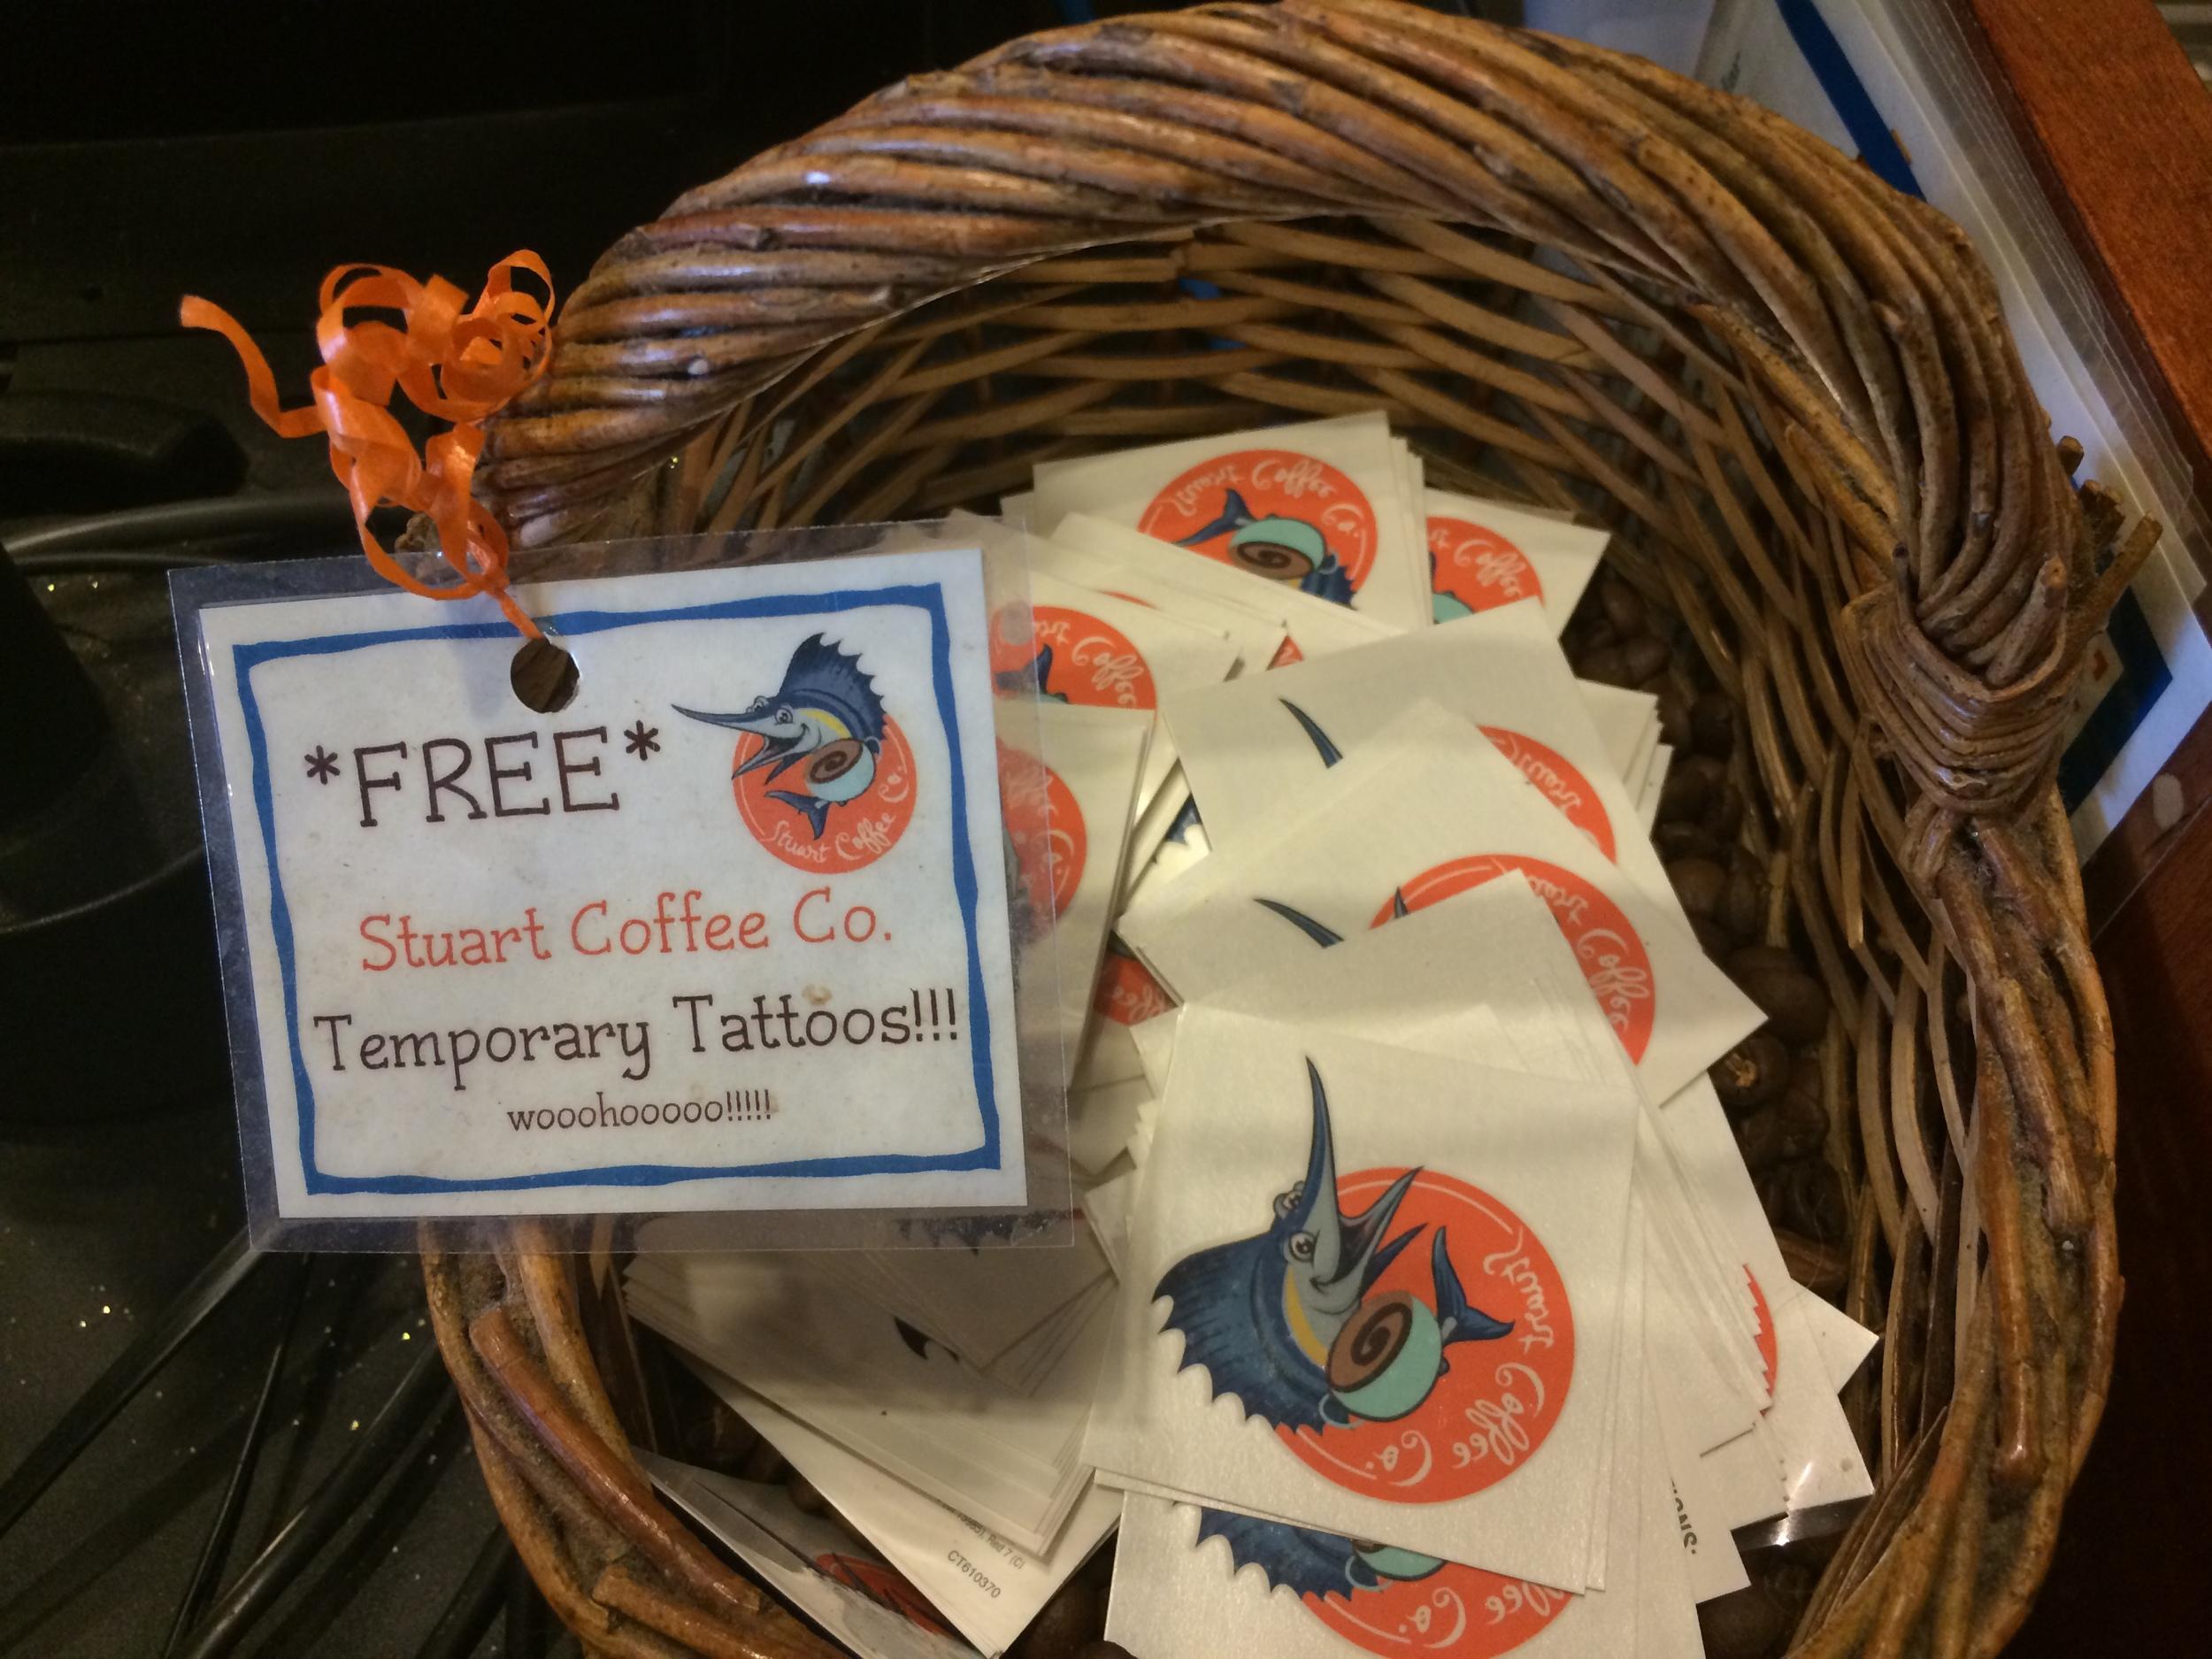 FREE Tattoos!